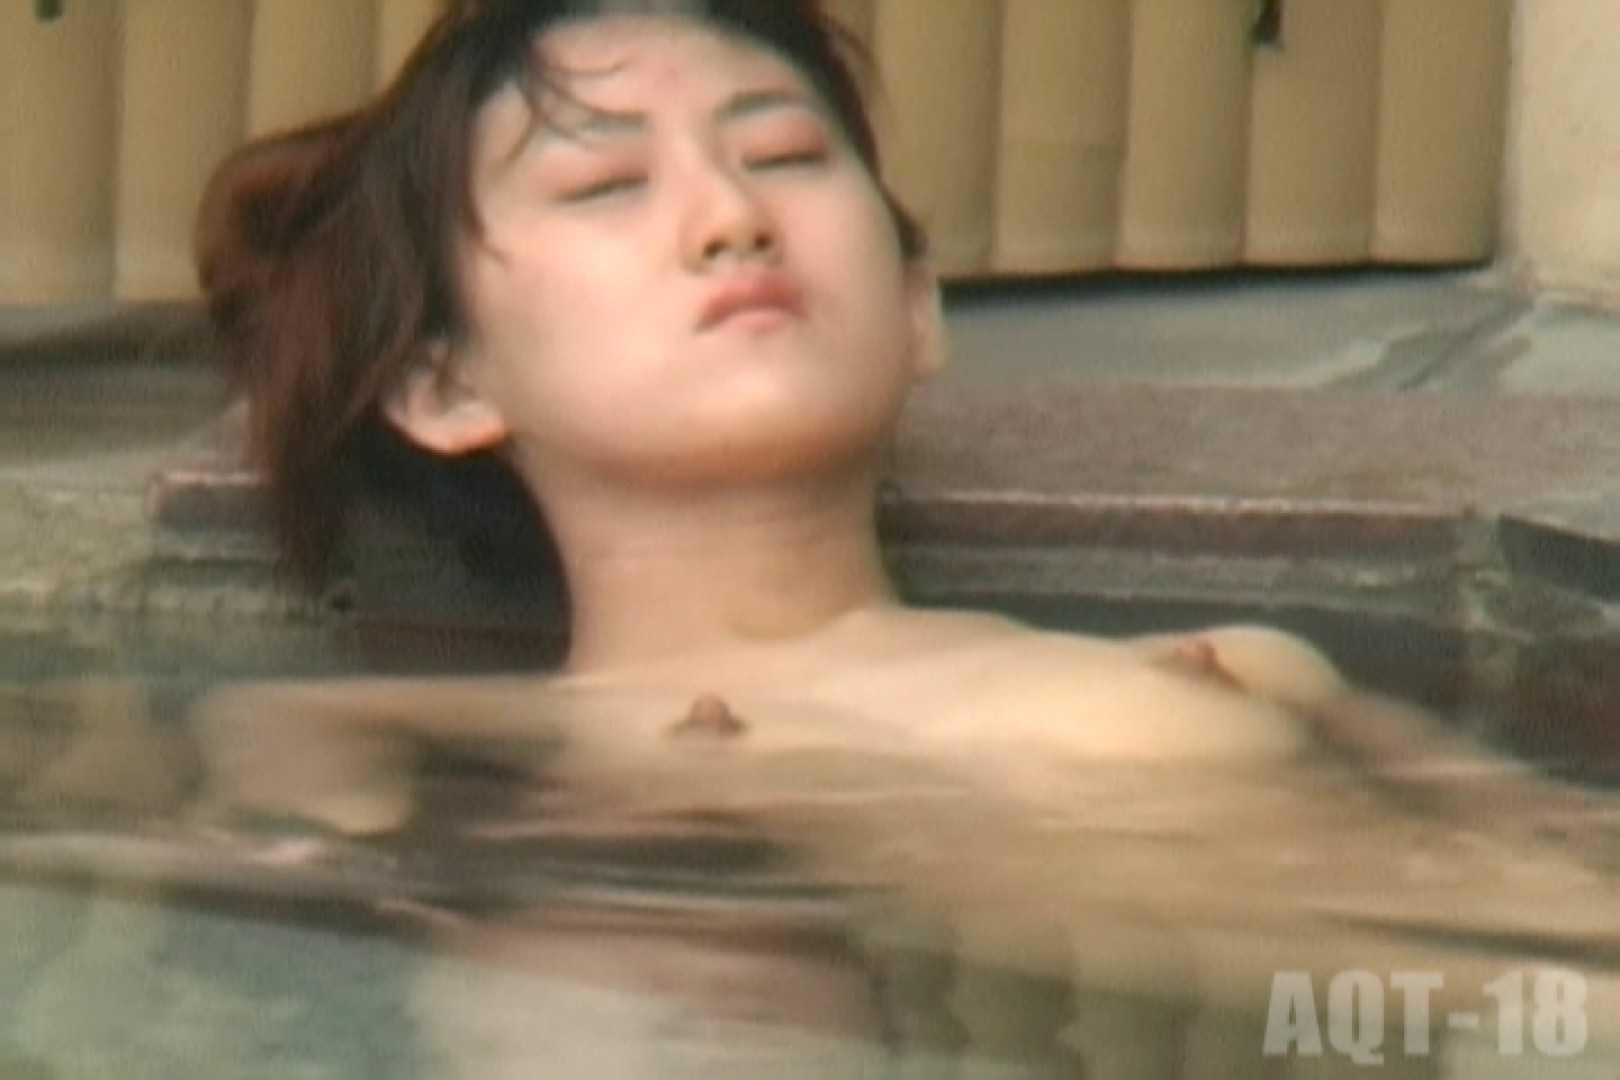 Aquaな露天風呂Vol.862 盗撮師作品  99pic 51